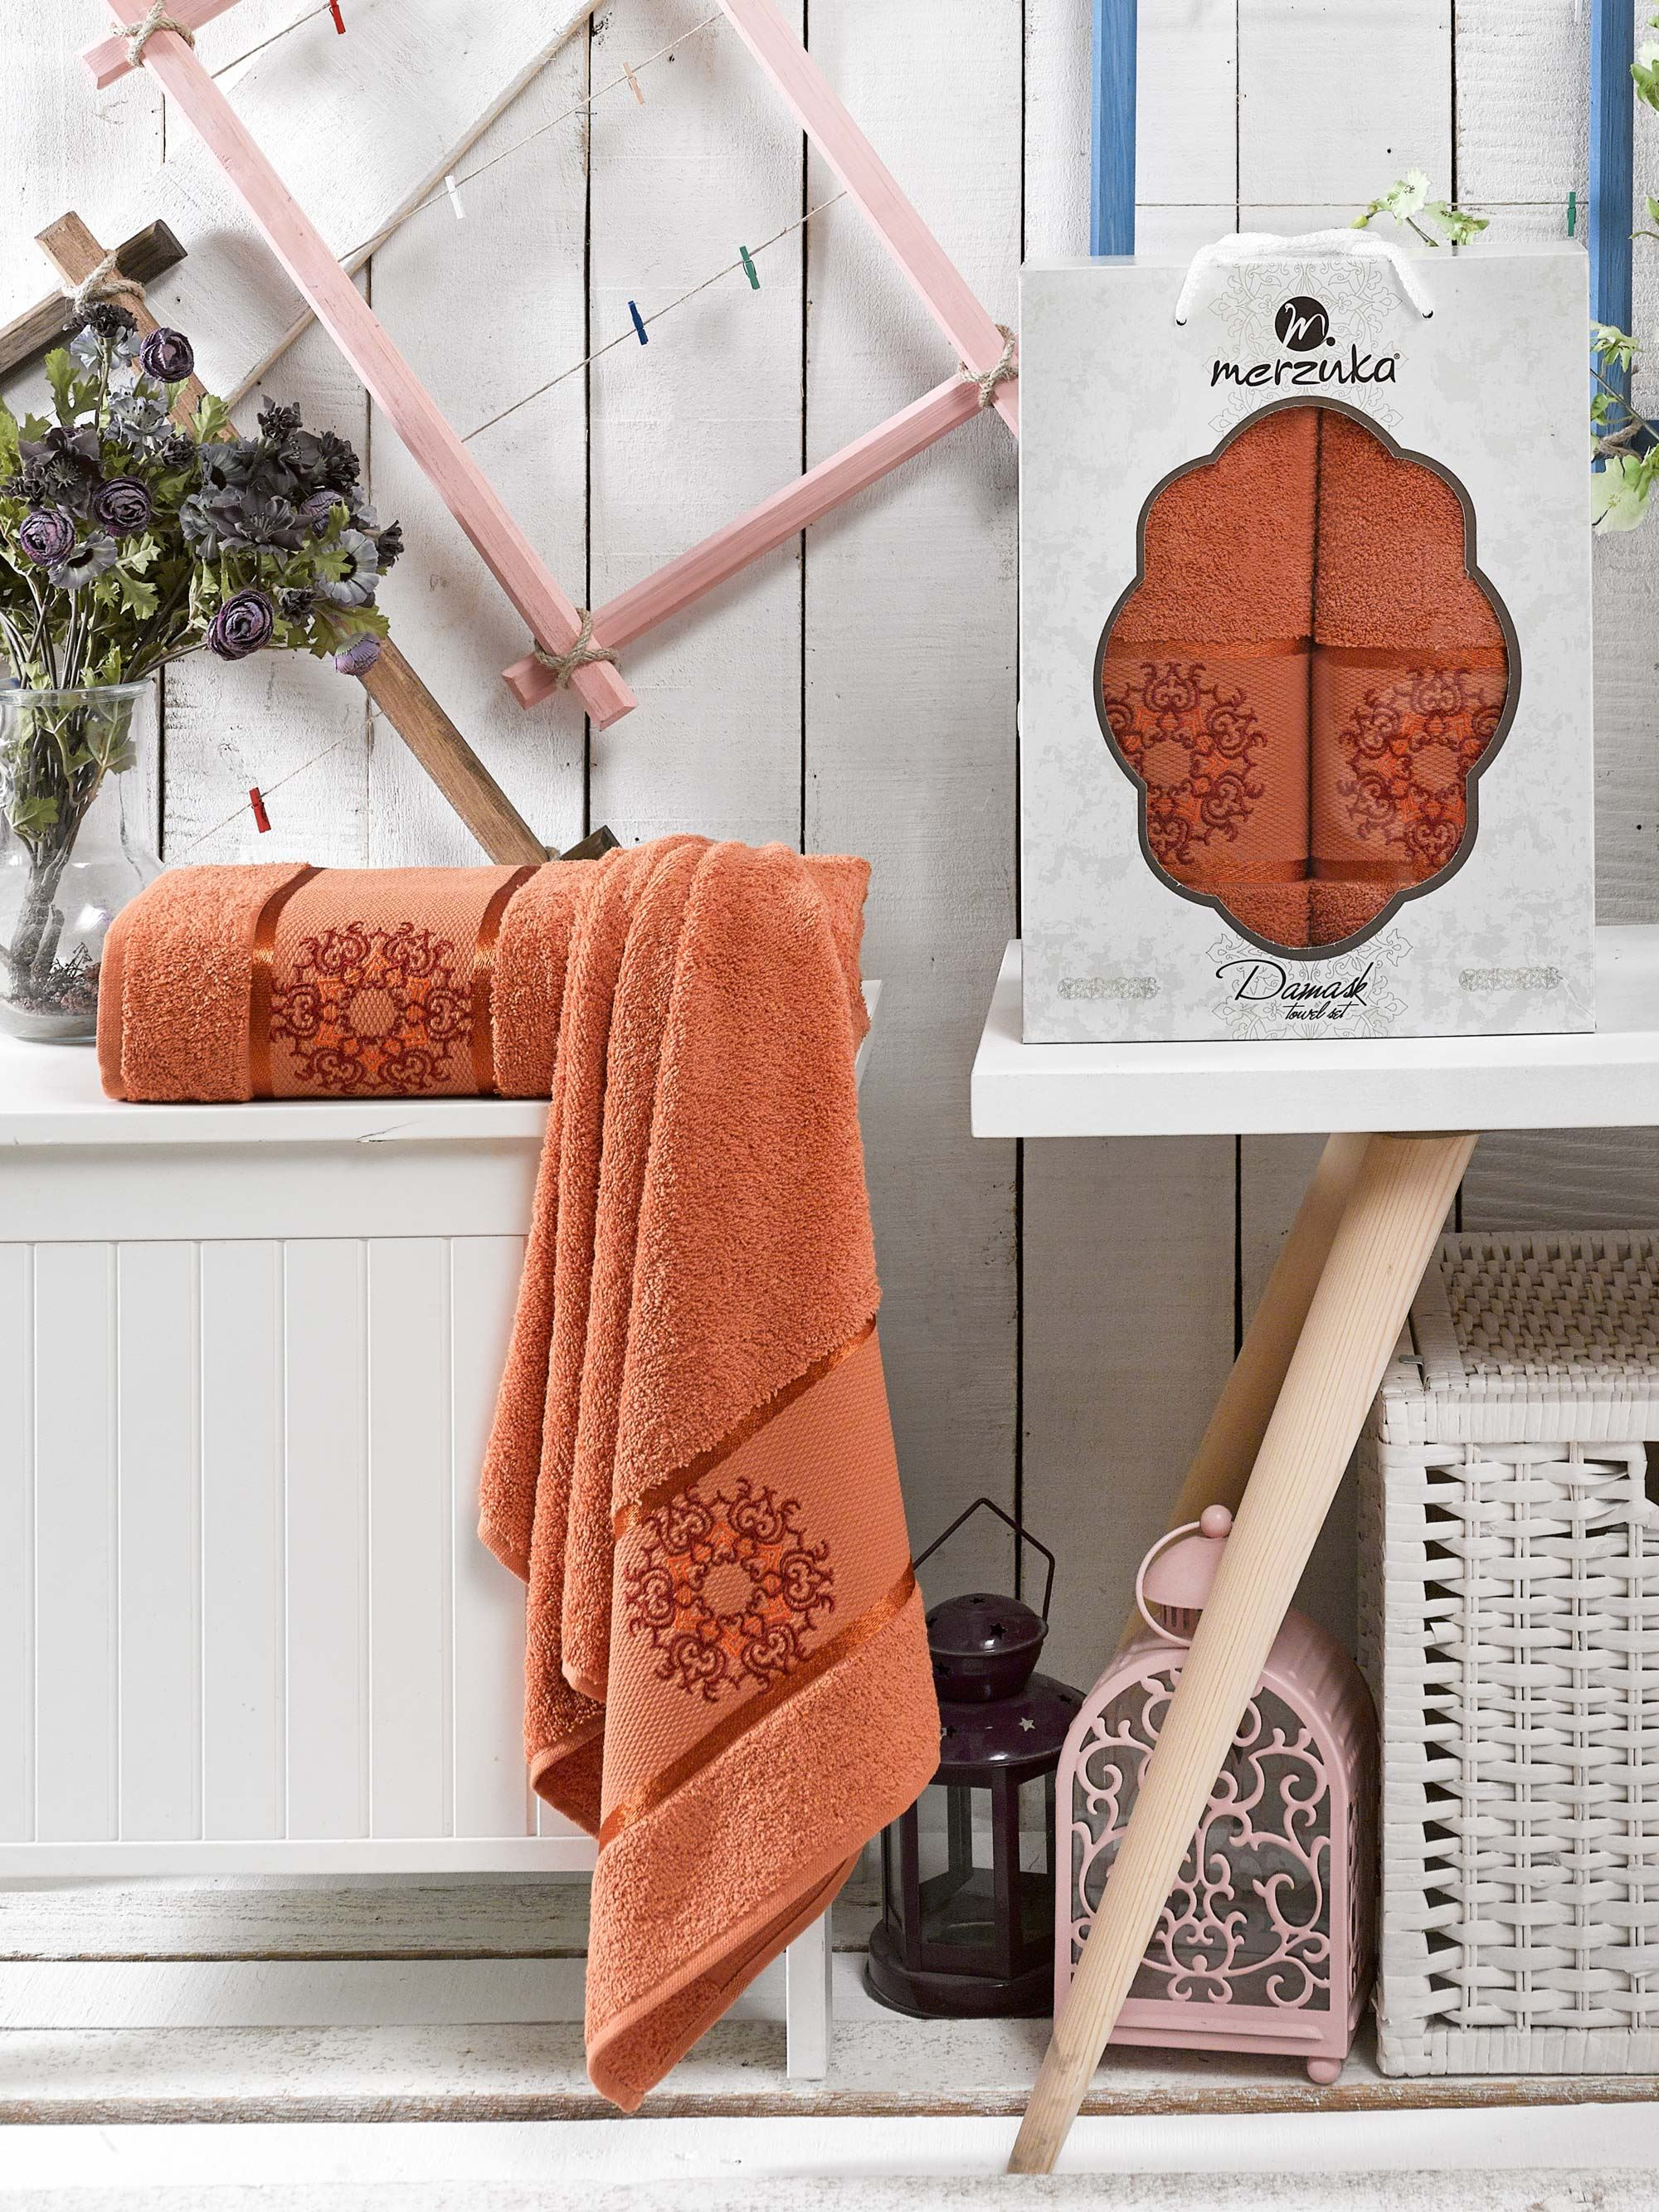 Полотенца Oran Merzuka Полотенце Damask Цвет: Терракотовый (50х80 см,70х130 см) набор из 3 полотенец merzuka sakura 50х90 2 70х140 8432 оранжевый